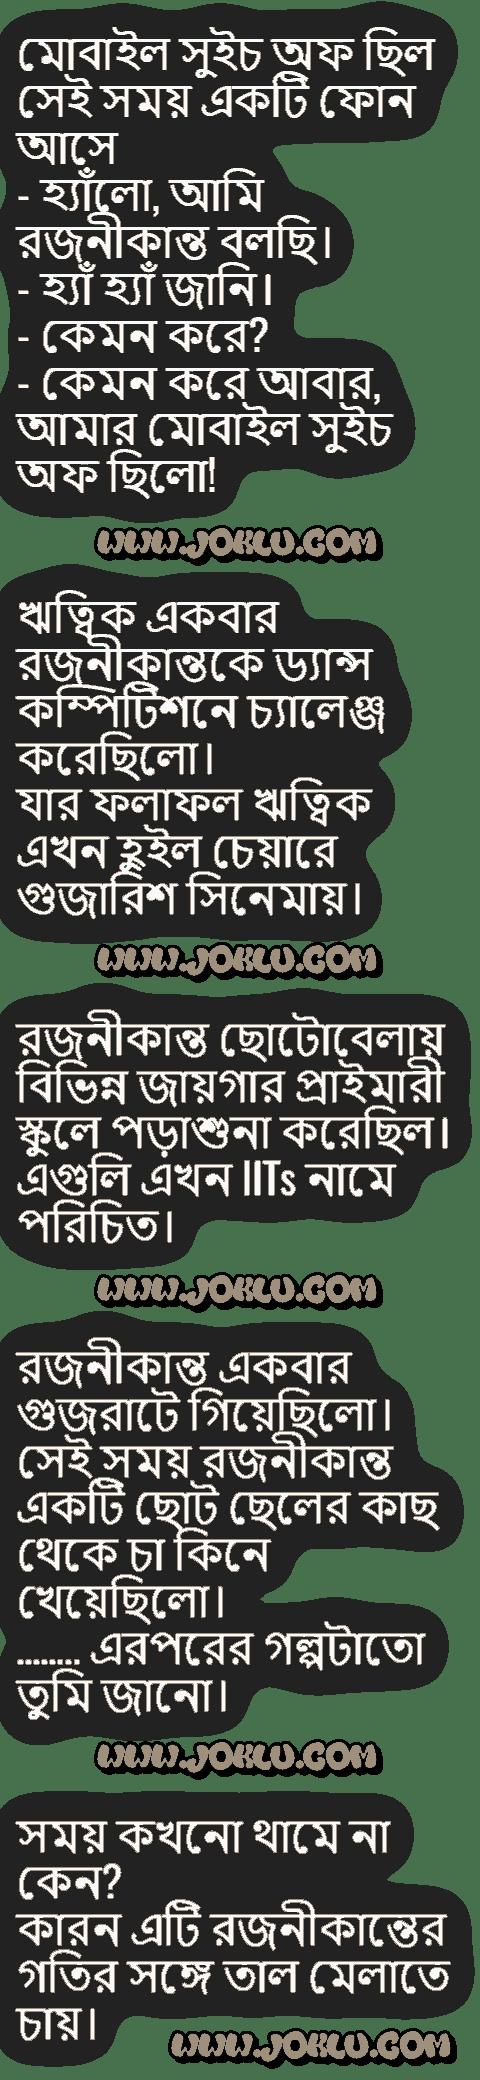 Rajanikant jokes in Bengali